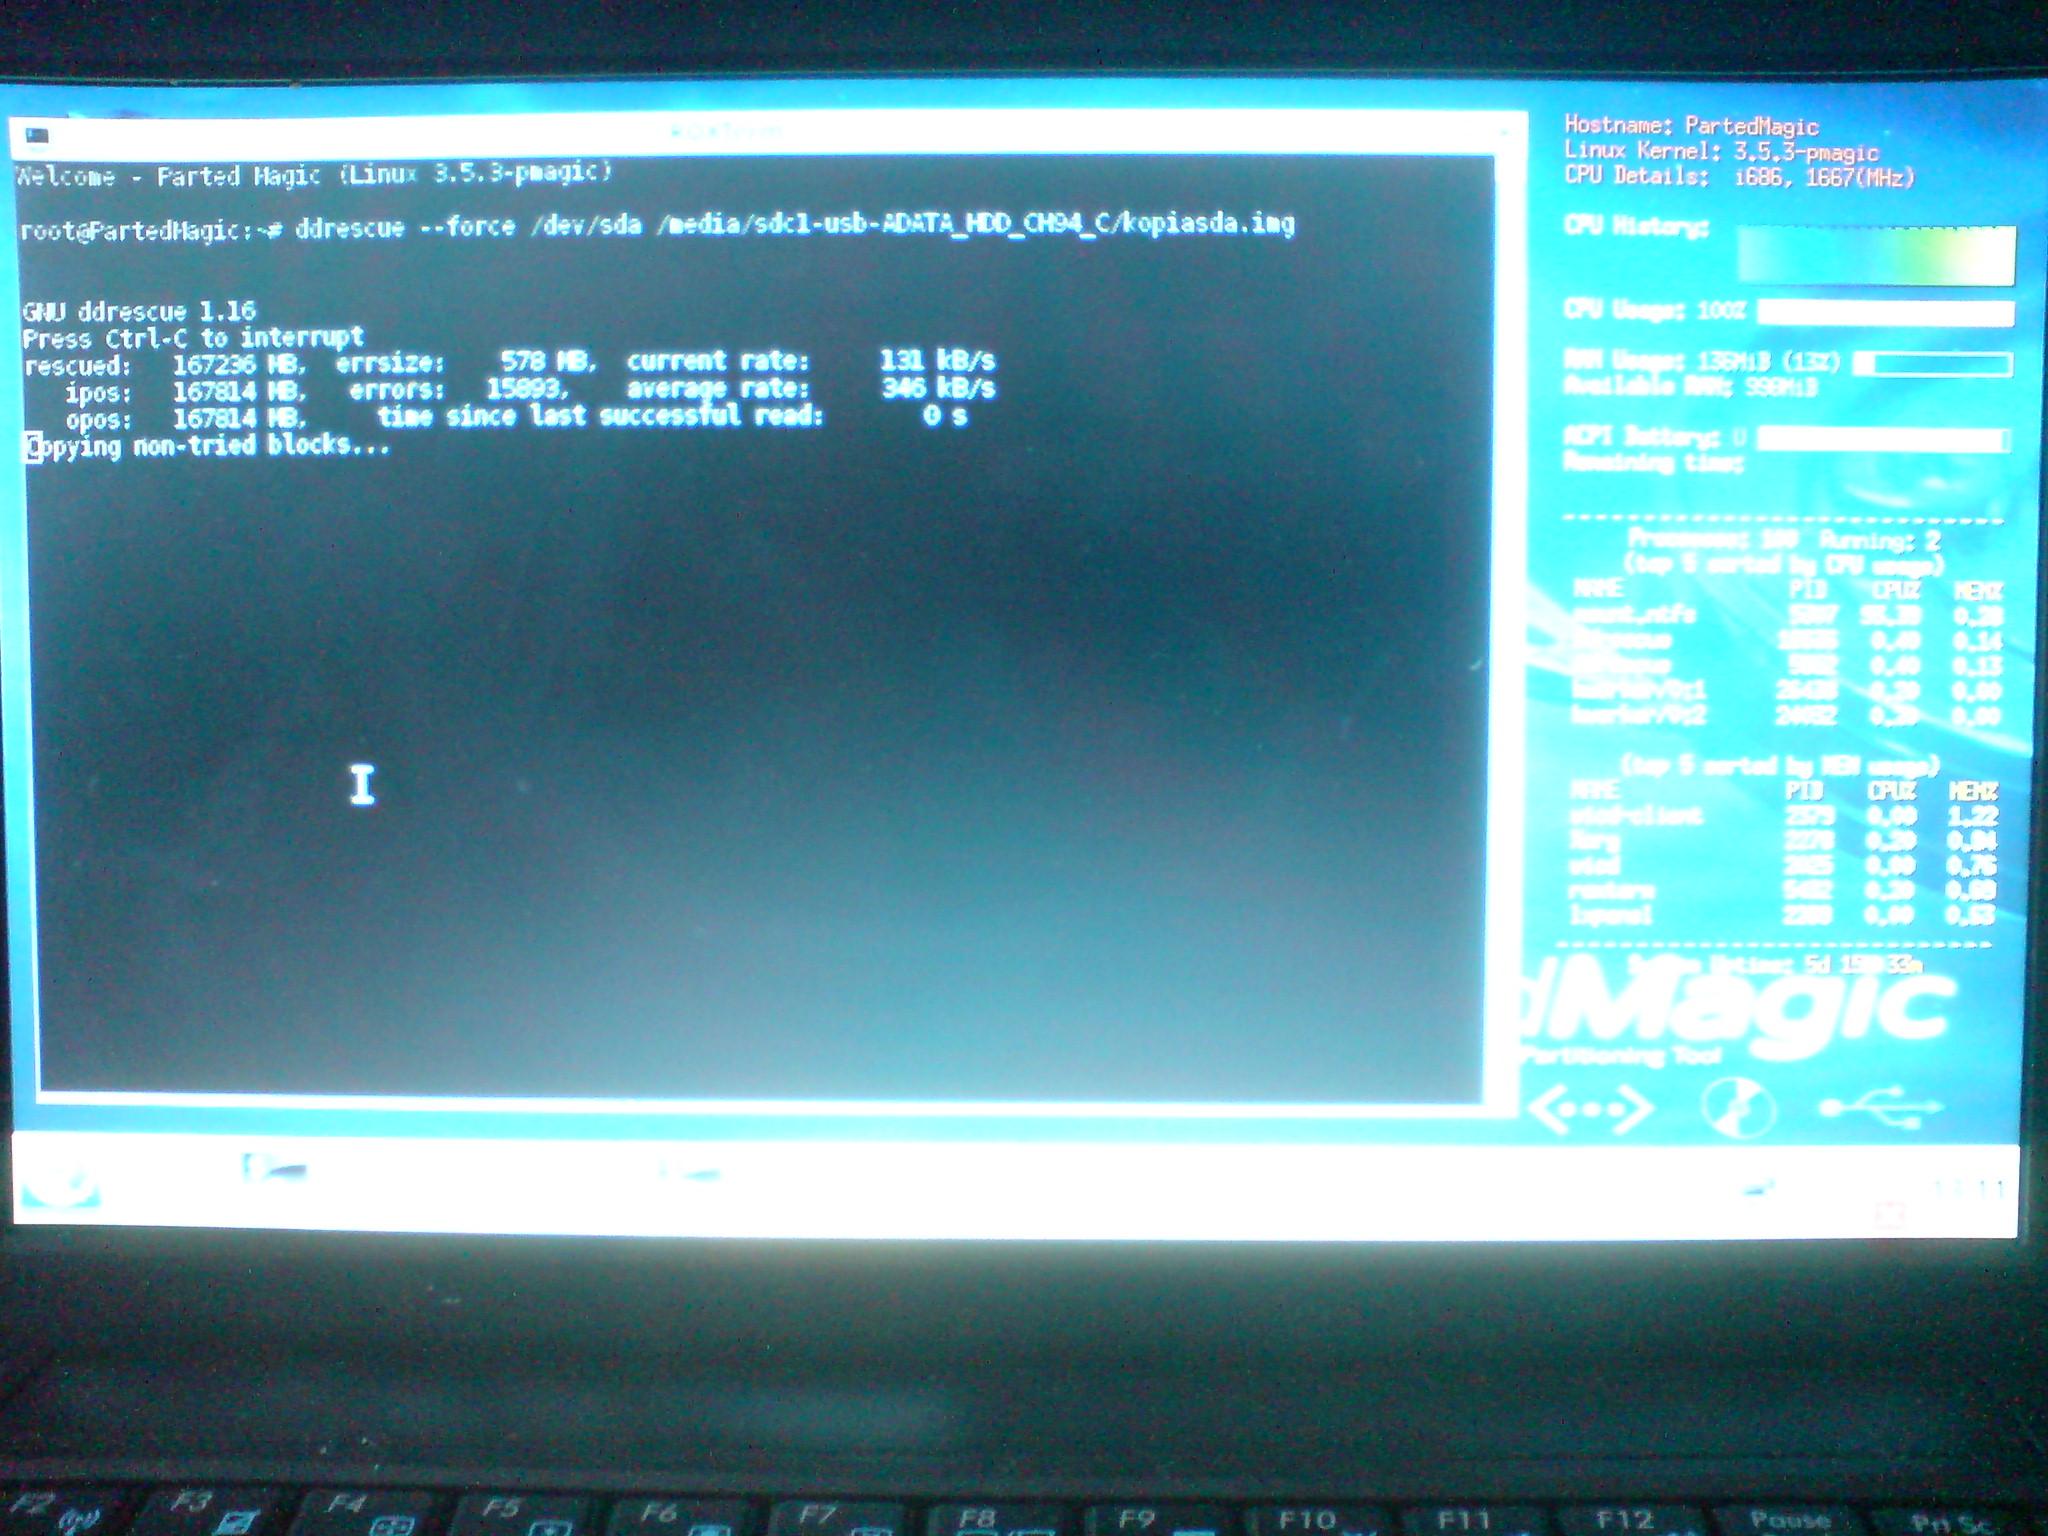 asus eee pc 1001pxd - Brak dost�pu do partycji NTFS na Lubuntu live cd